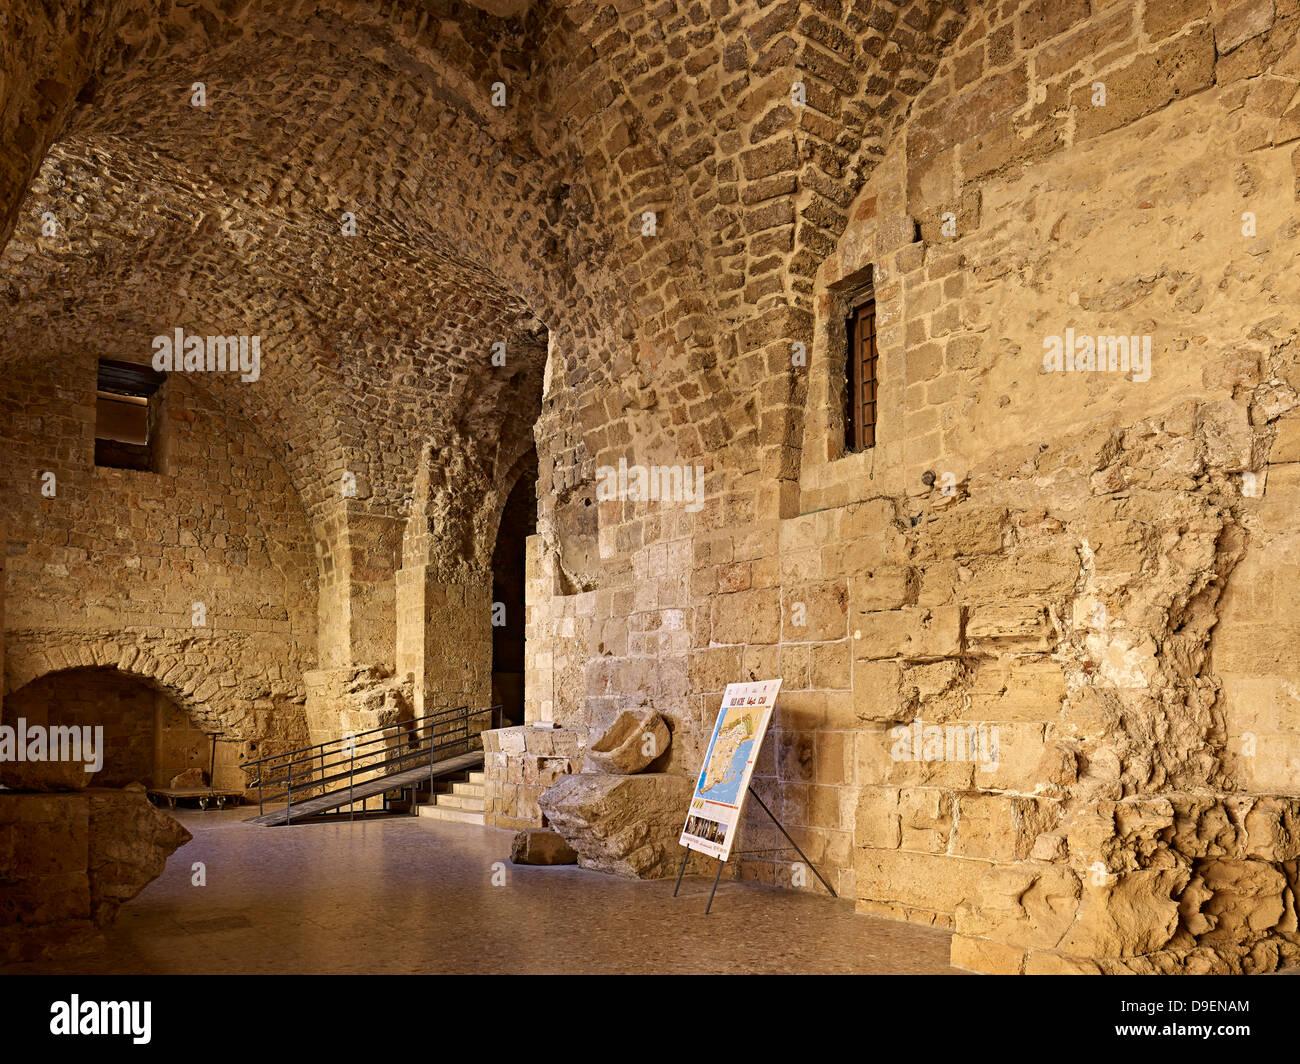 Citadelle de Acre, Israël Photo Stock